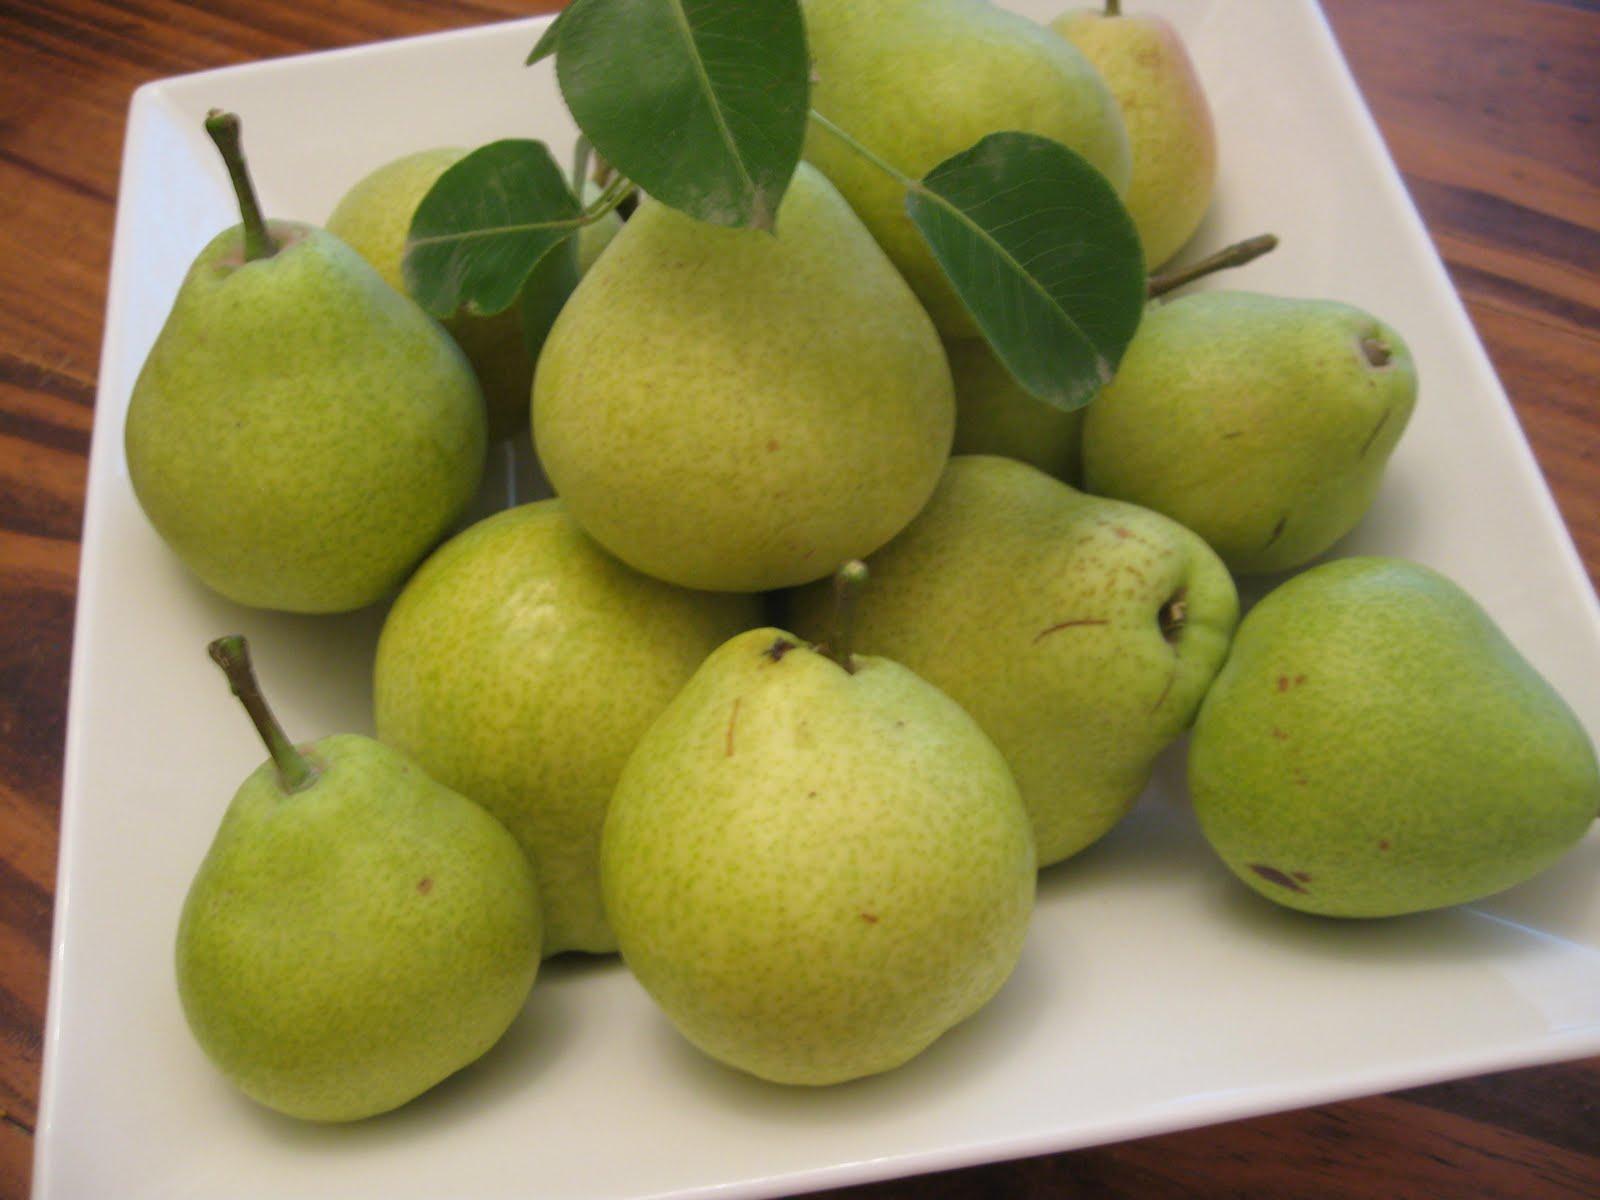 Pear 'Kieffer-1355